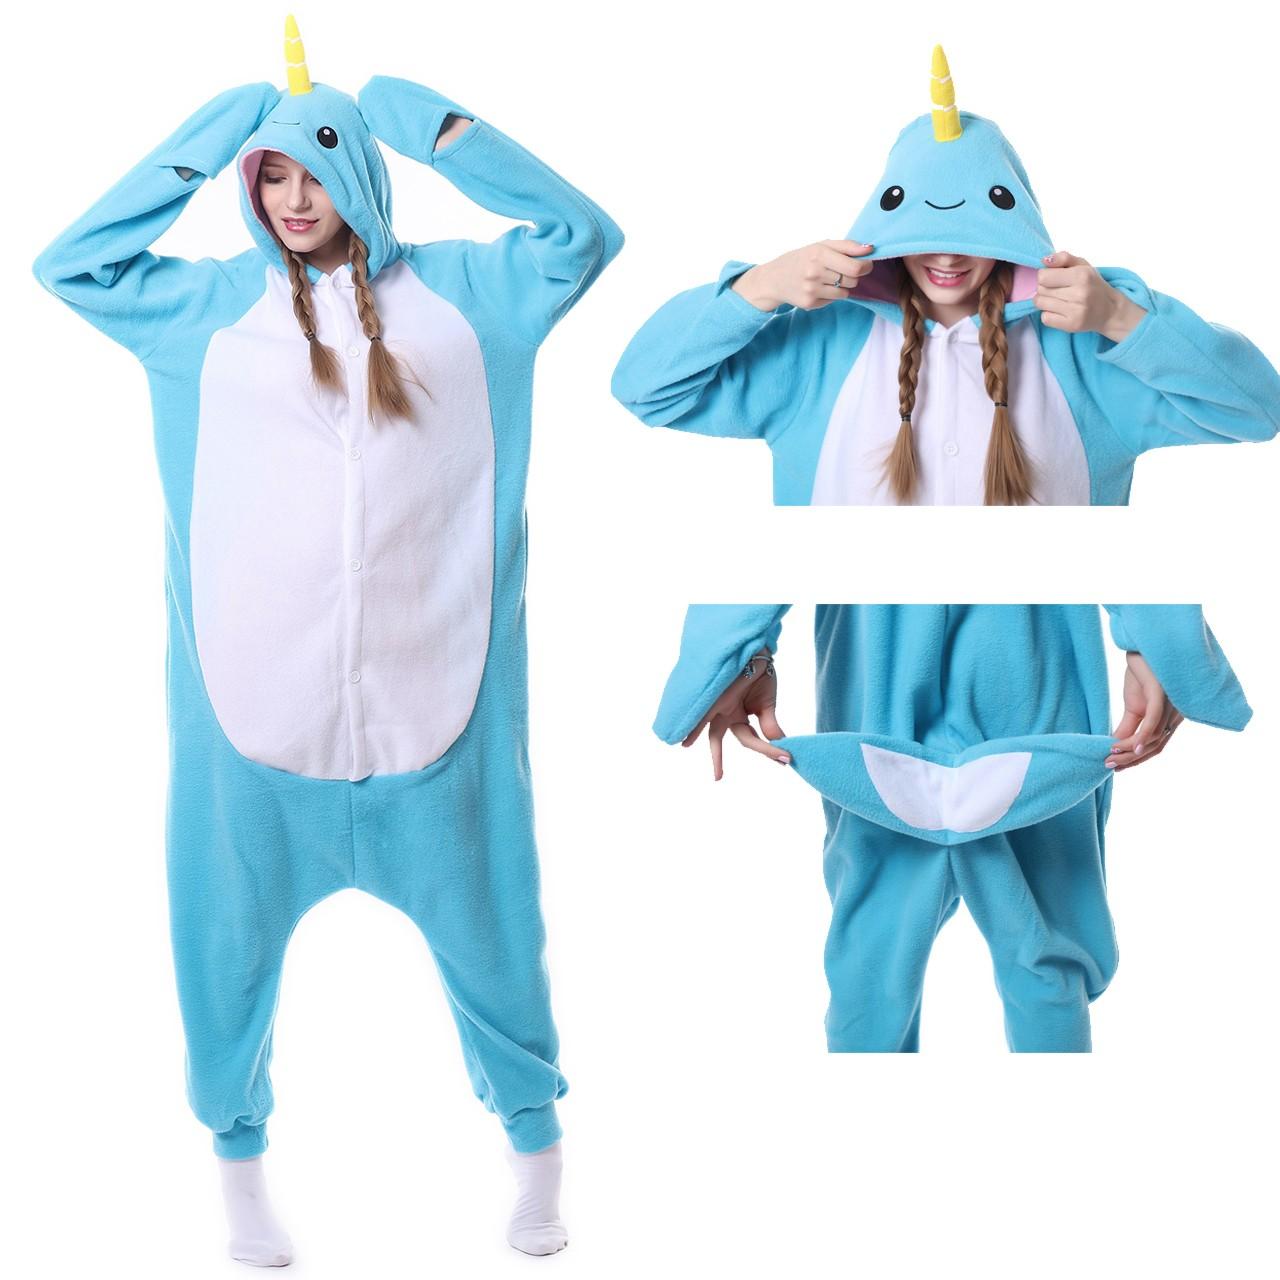 bcb9ded25b0 Narwhal Onesie Animal Kigurumi Pajama Women   Men Halloween Carnival  Costumes